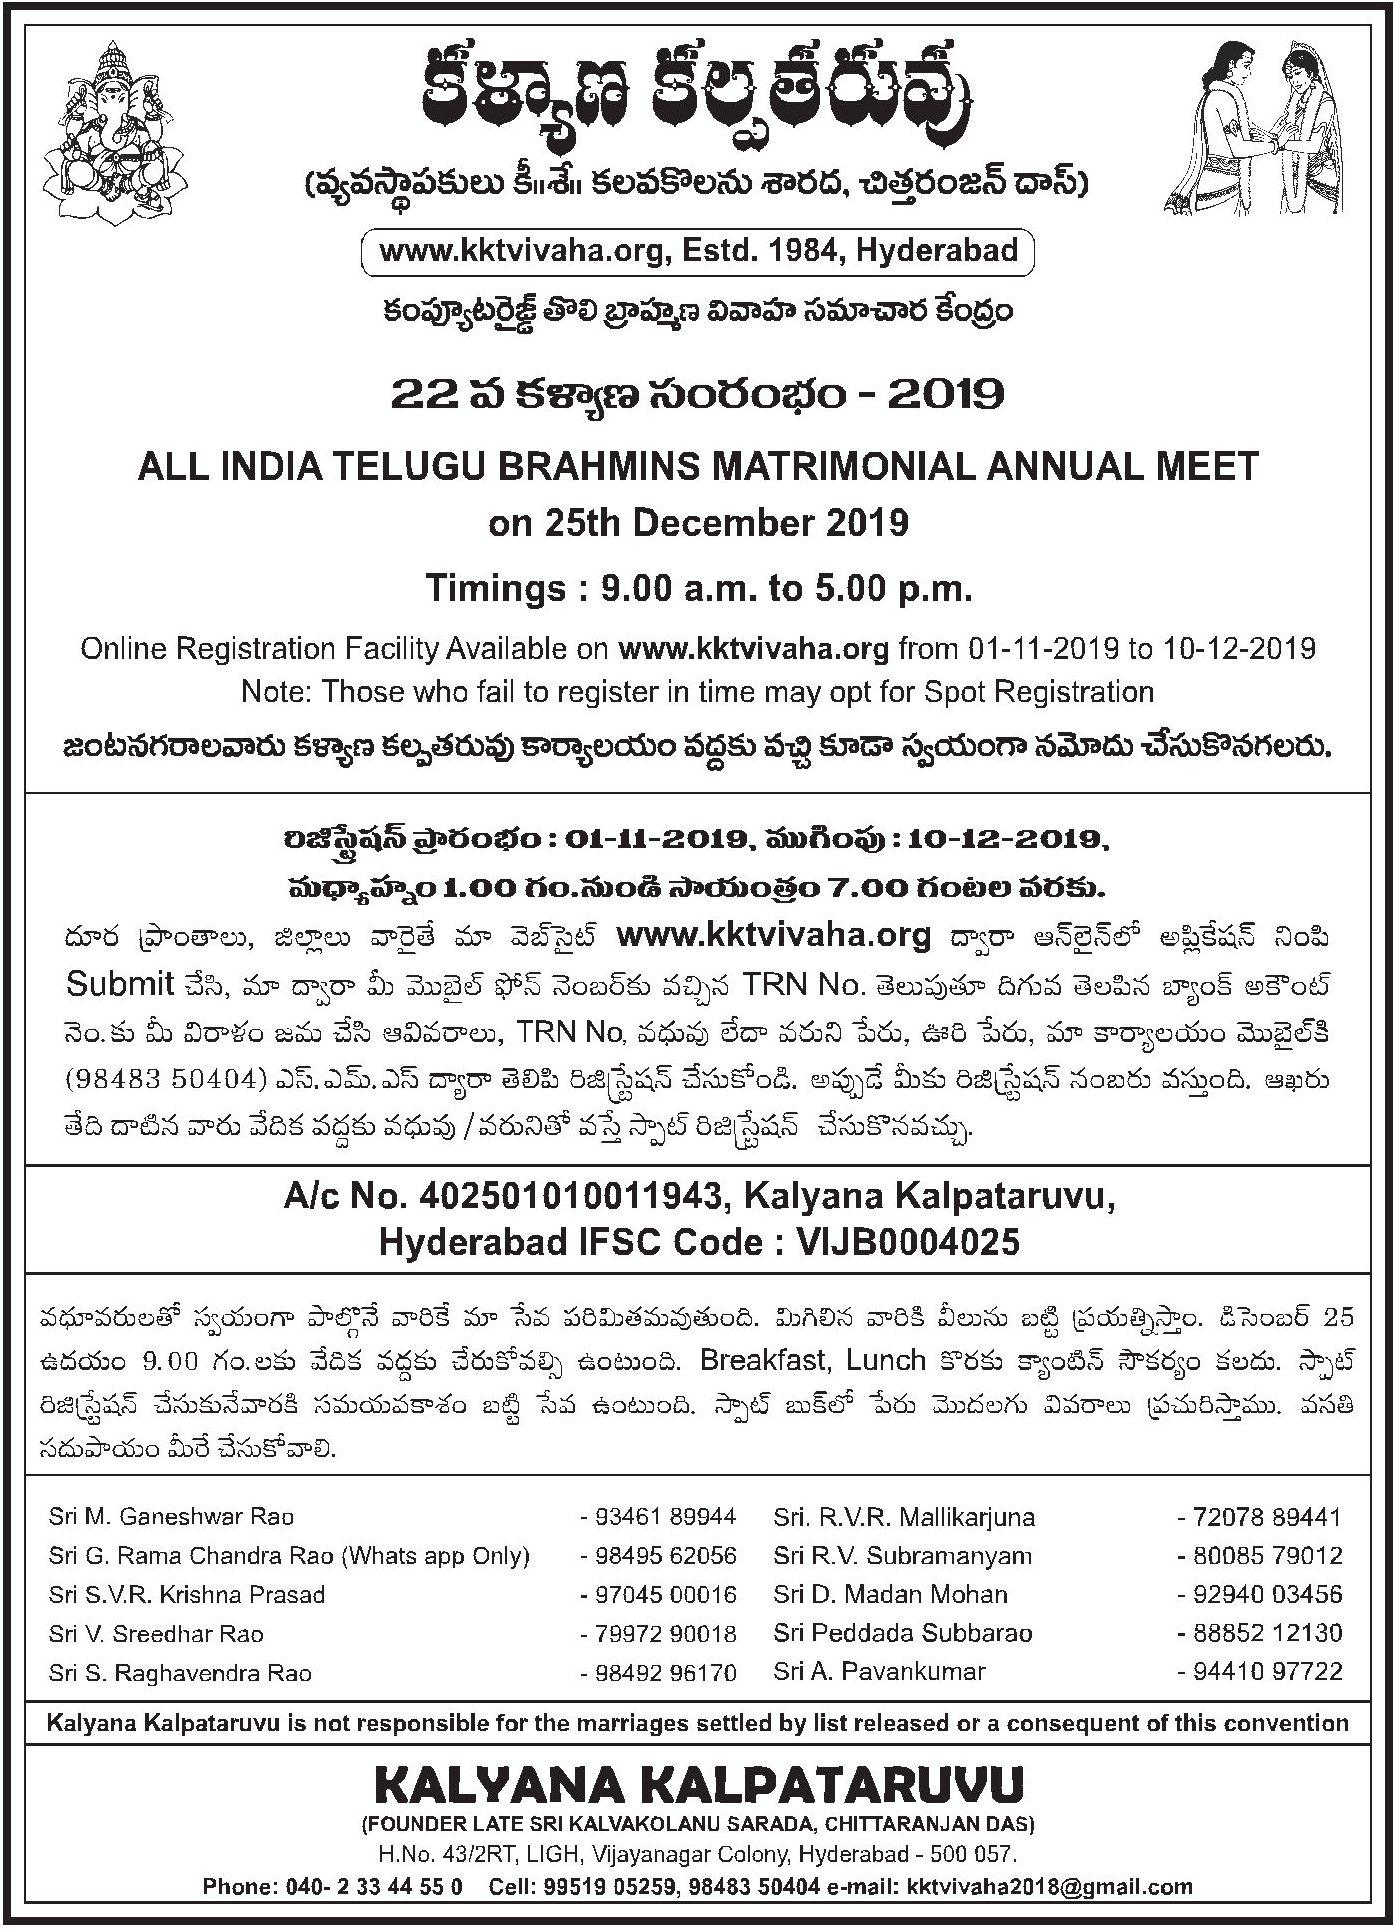 Phamplete-2019 Vijaya Bank Application Form Filling on filling application equipment, asp.net web forms, filling potholes in road,